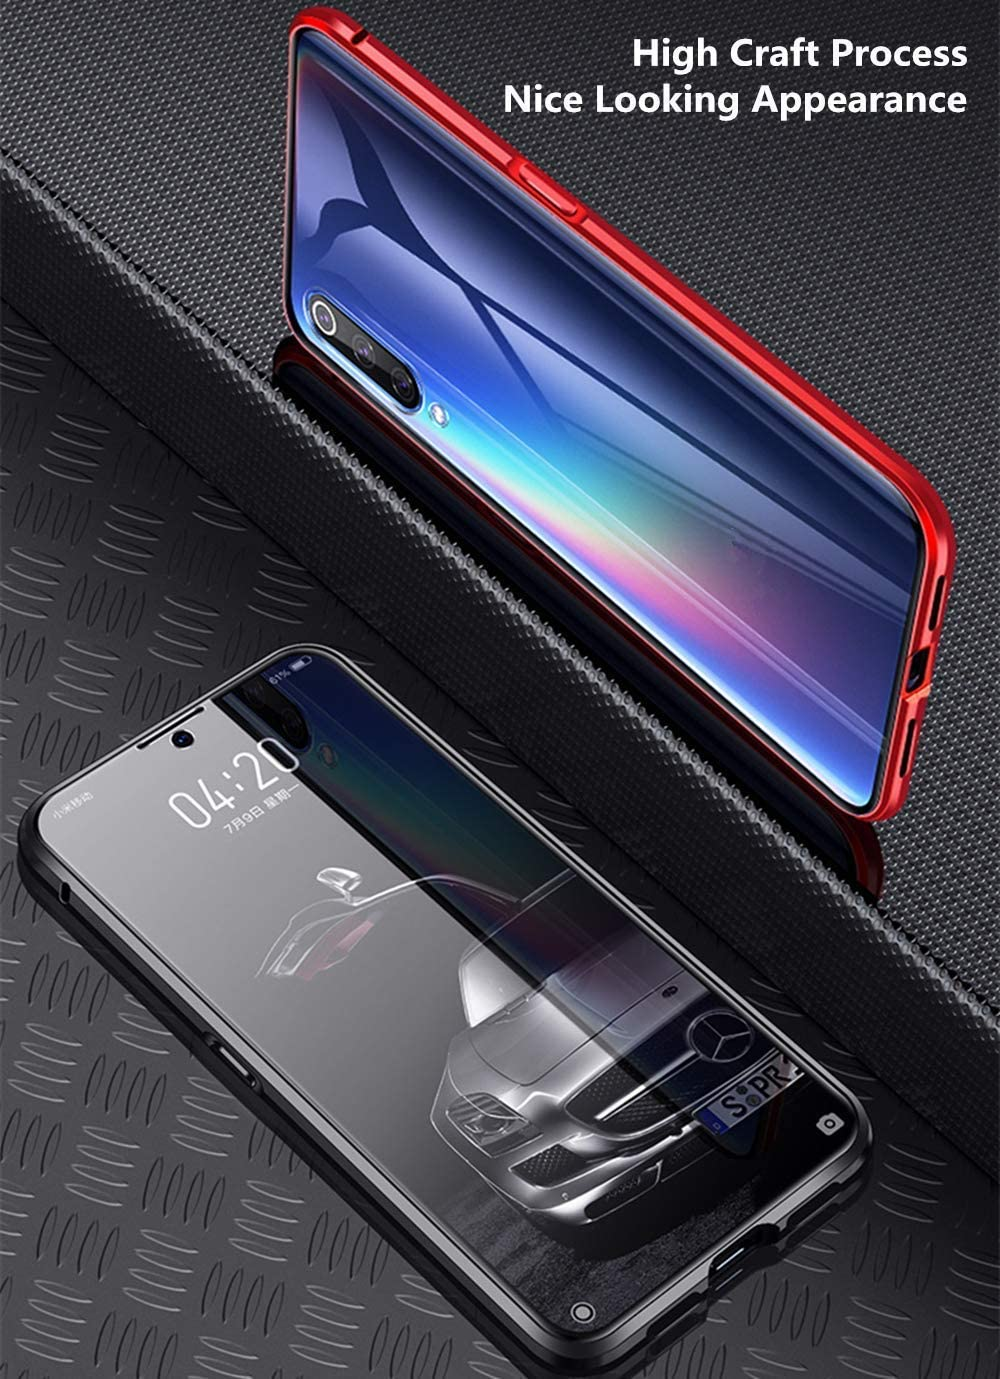 Funda para Xiaomi Redmi Note 8 Carcasa Adsorcion Magnetica Cover 360 Grados Proteccion Doble H/áptico Vidrio Templado Transparente Imanes Potentes Marco Aluminio Anti Choque Metal Bumper Cubierta